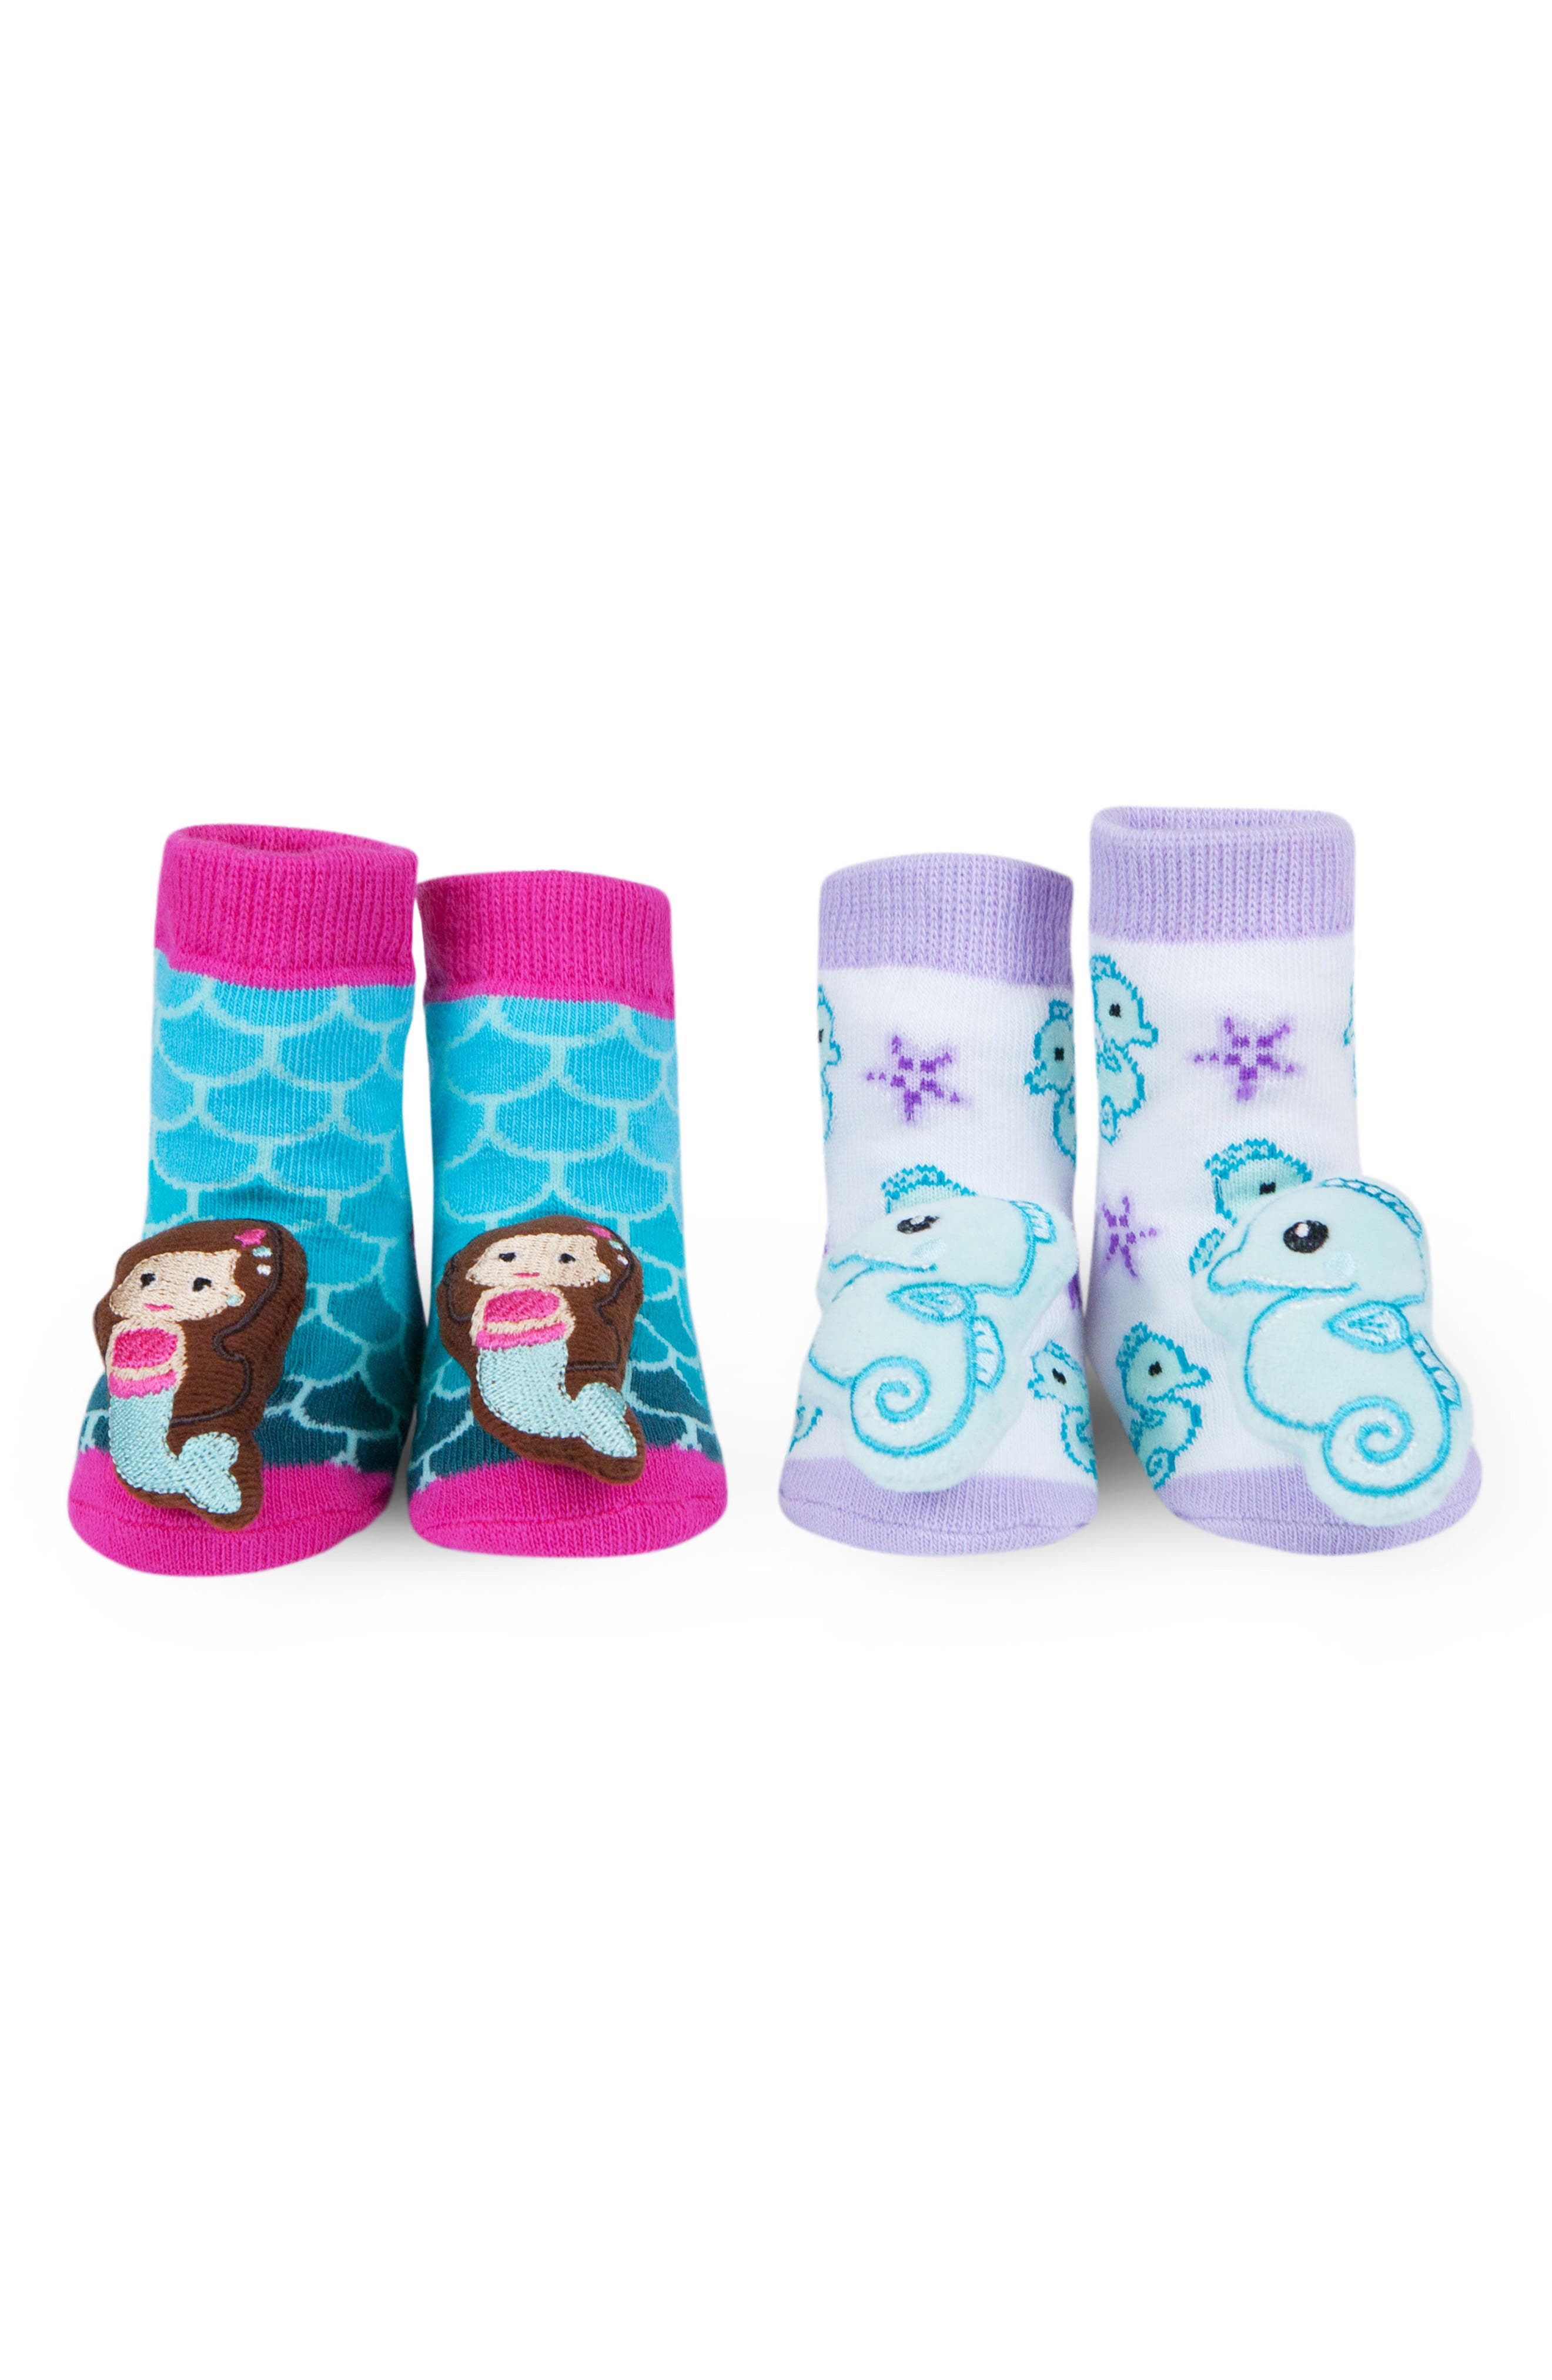 Mermaids 2-Pack Rattle Socks,                             Main thumbnail 1, color,                             Fuchsia/ Light Purple